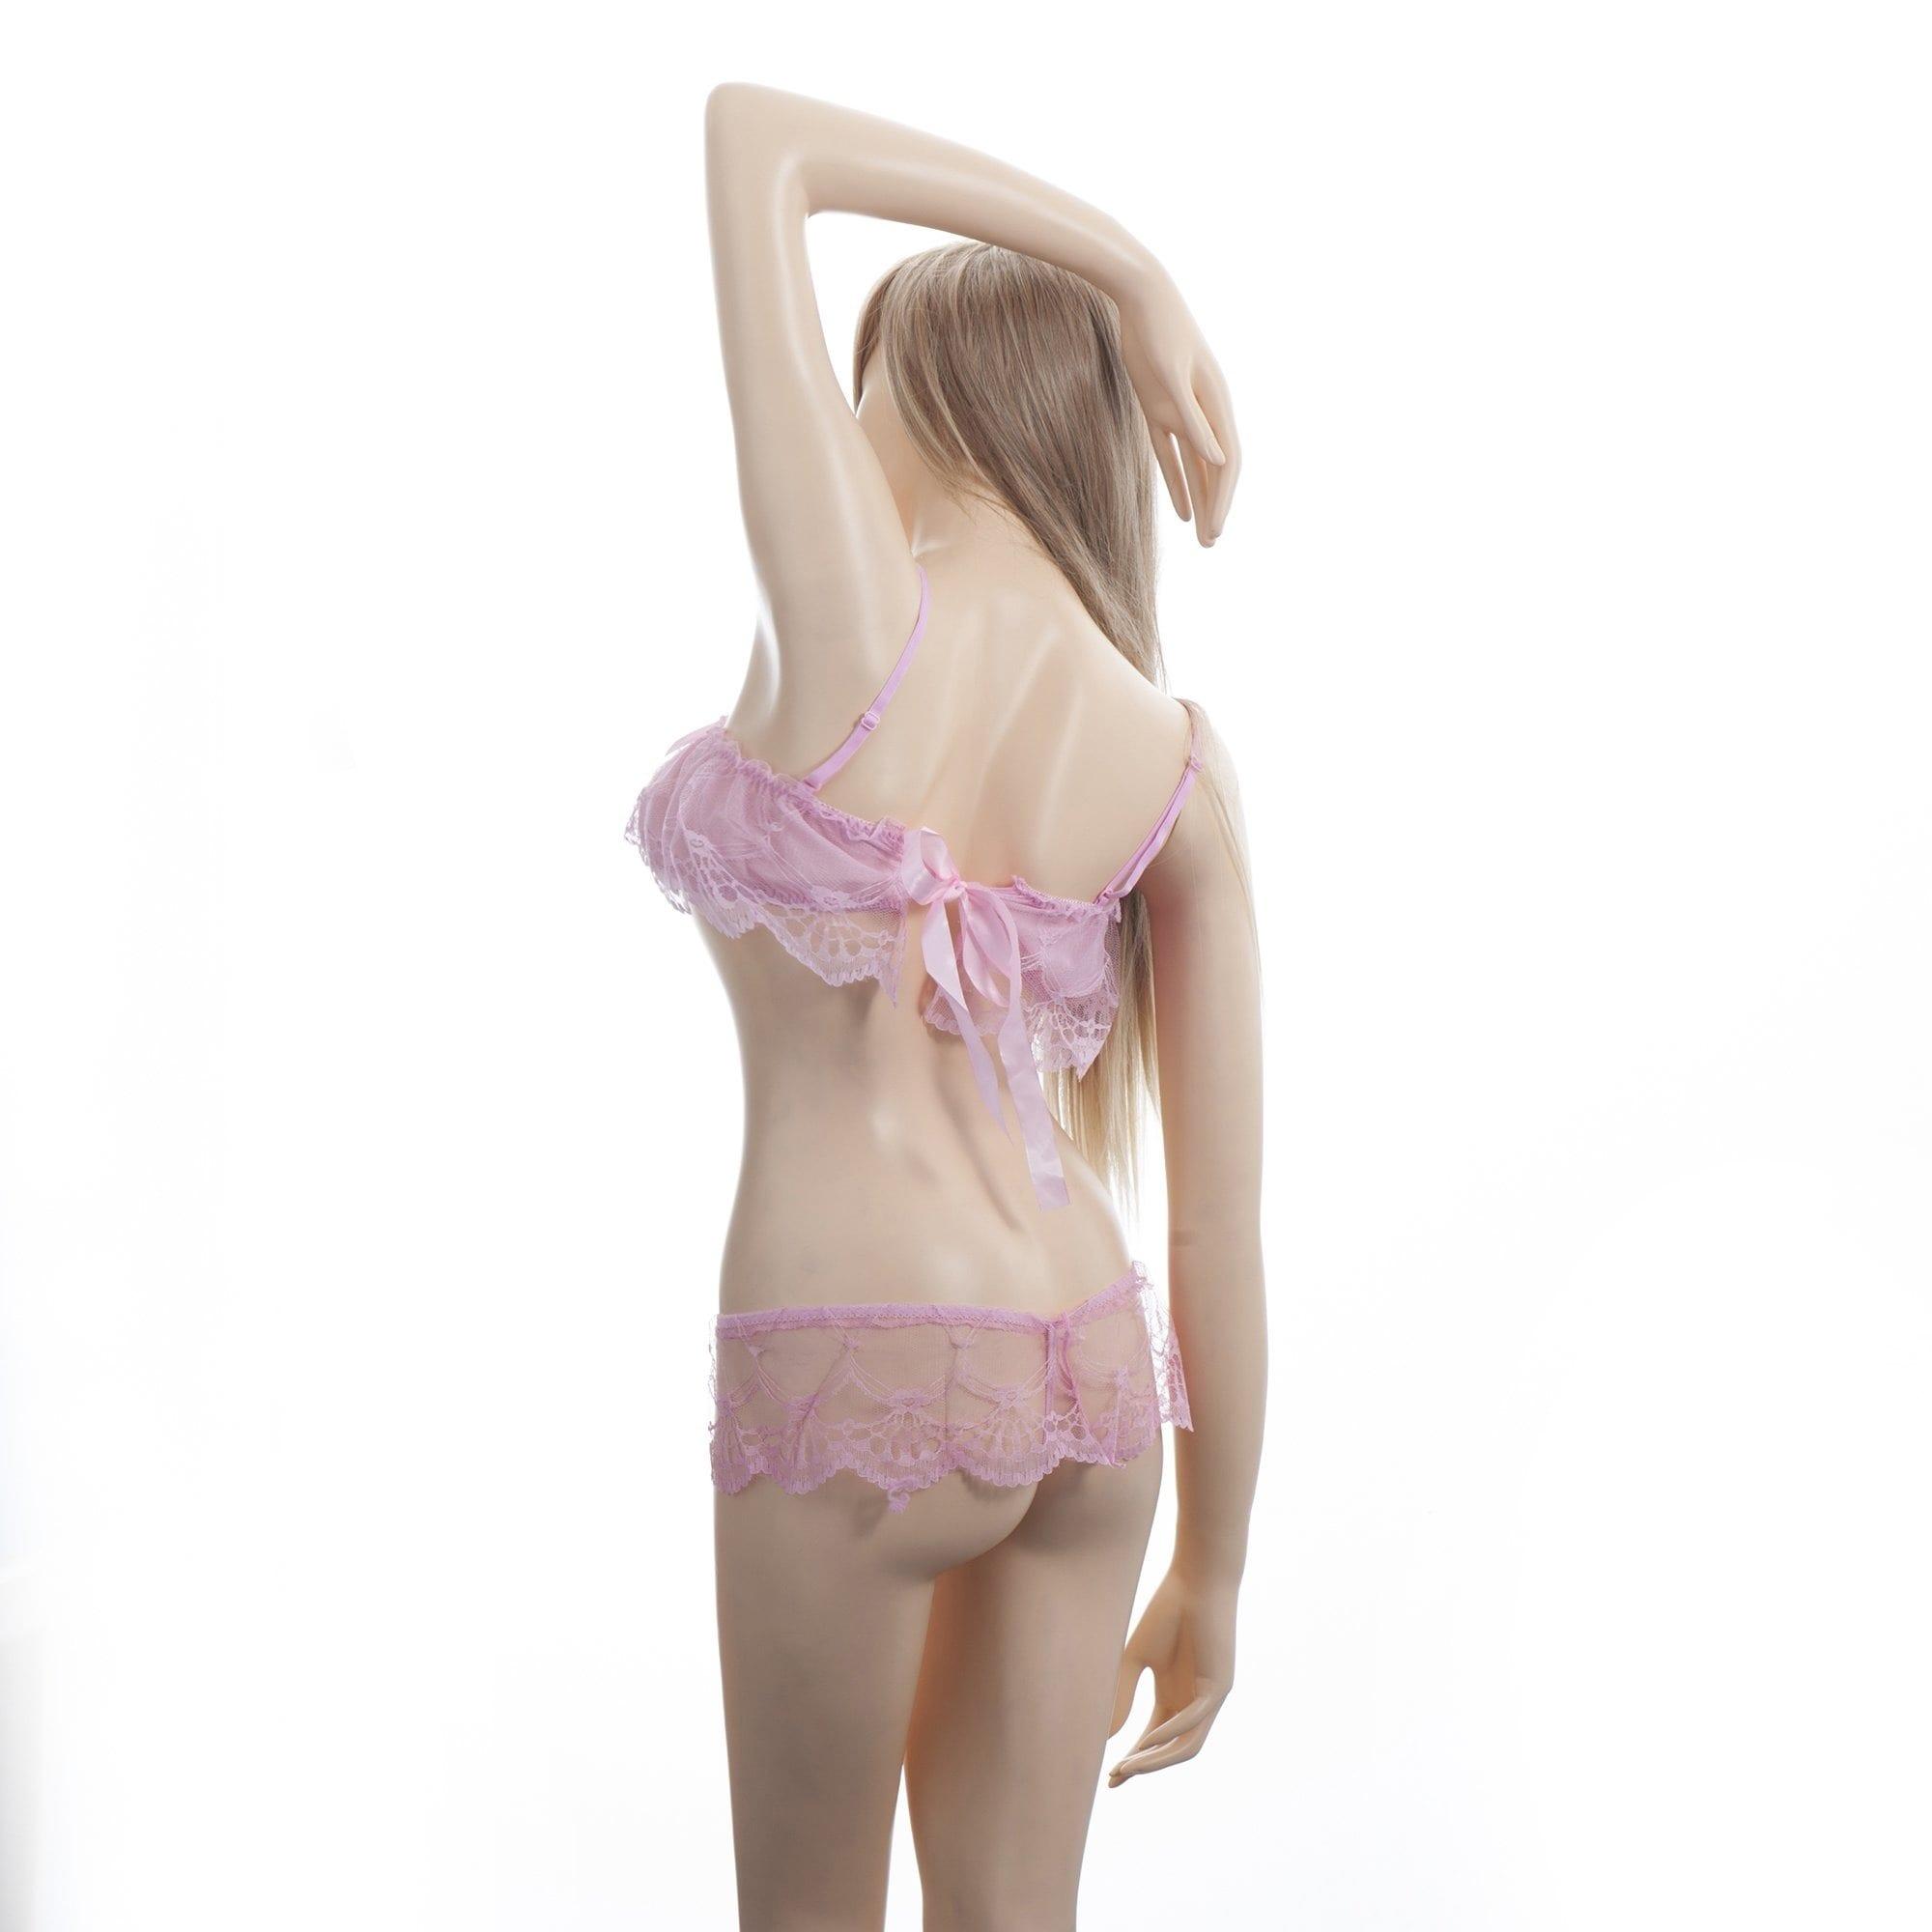 Lingerie for Women,ZODRQ Ladies Lingerie One-Piece Garment Lace Mesh Underwear V Neck Sleepwear Chemise